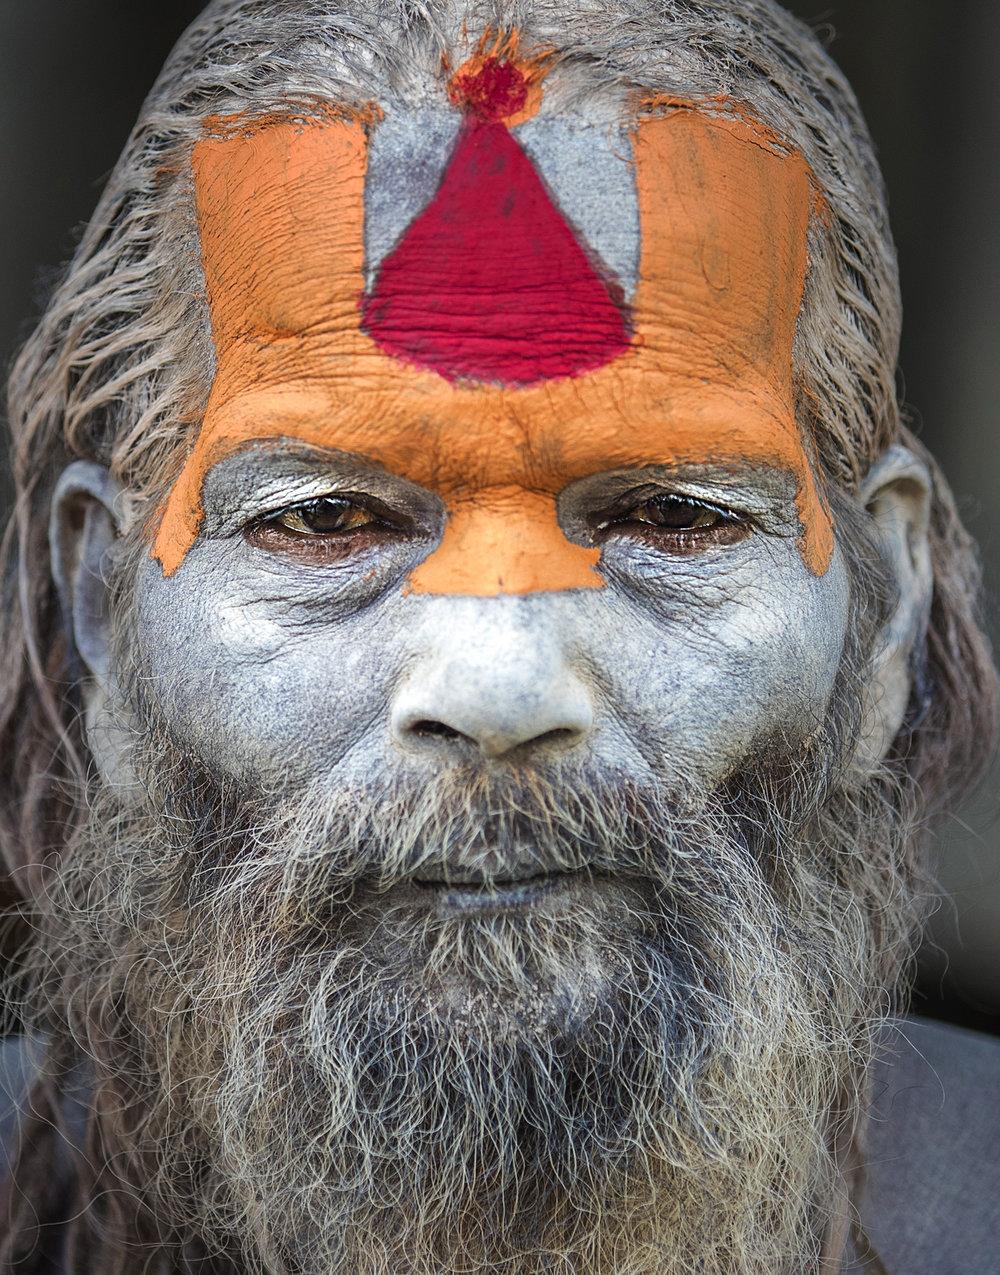 Simon+Needham+Humanitarian+Photography+Nepal+26.jpg